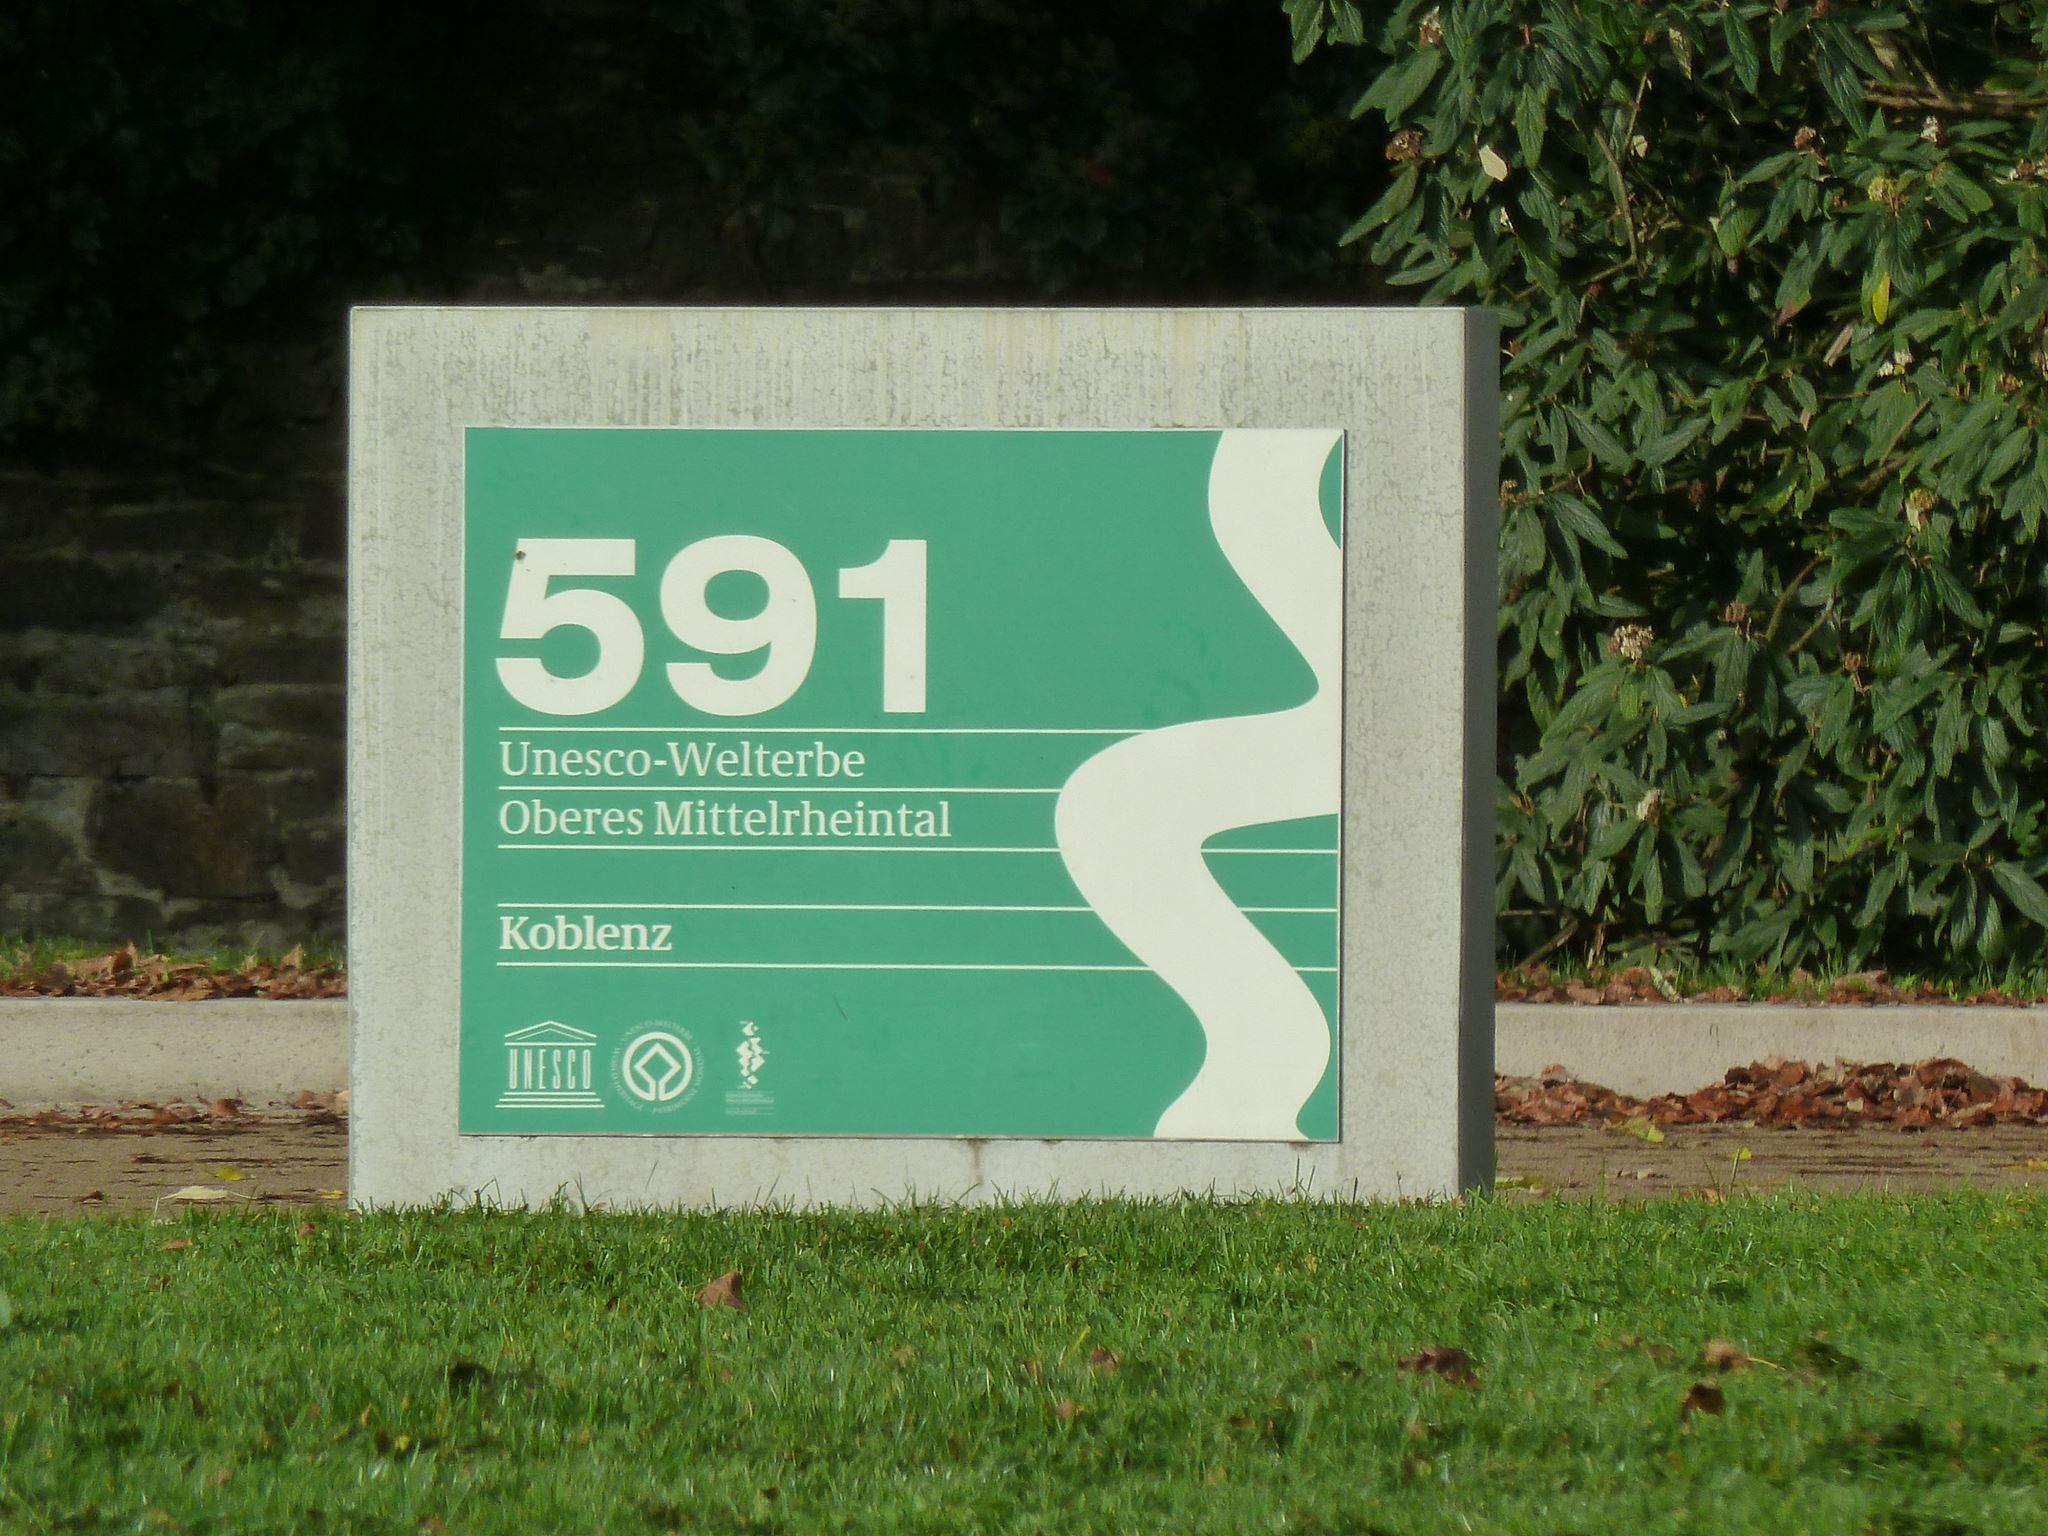 rheinkilometer-591-weltkulturerbe